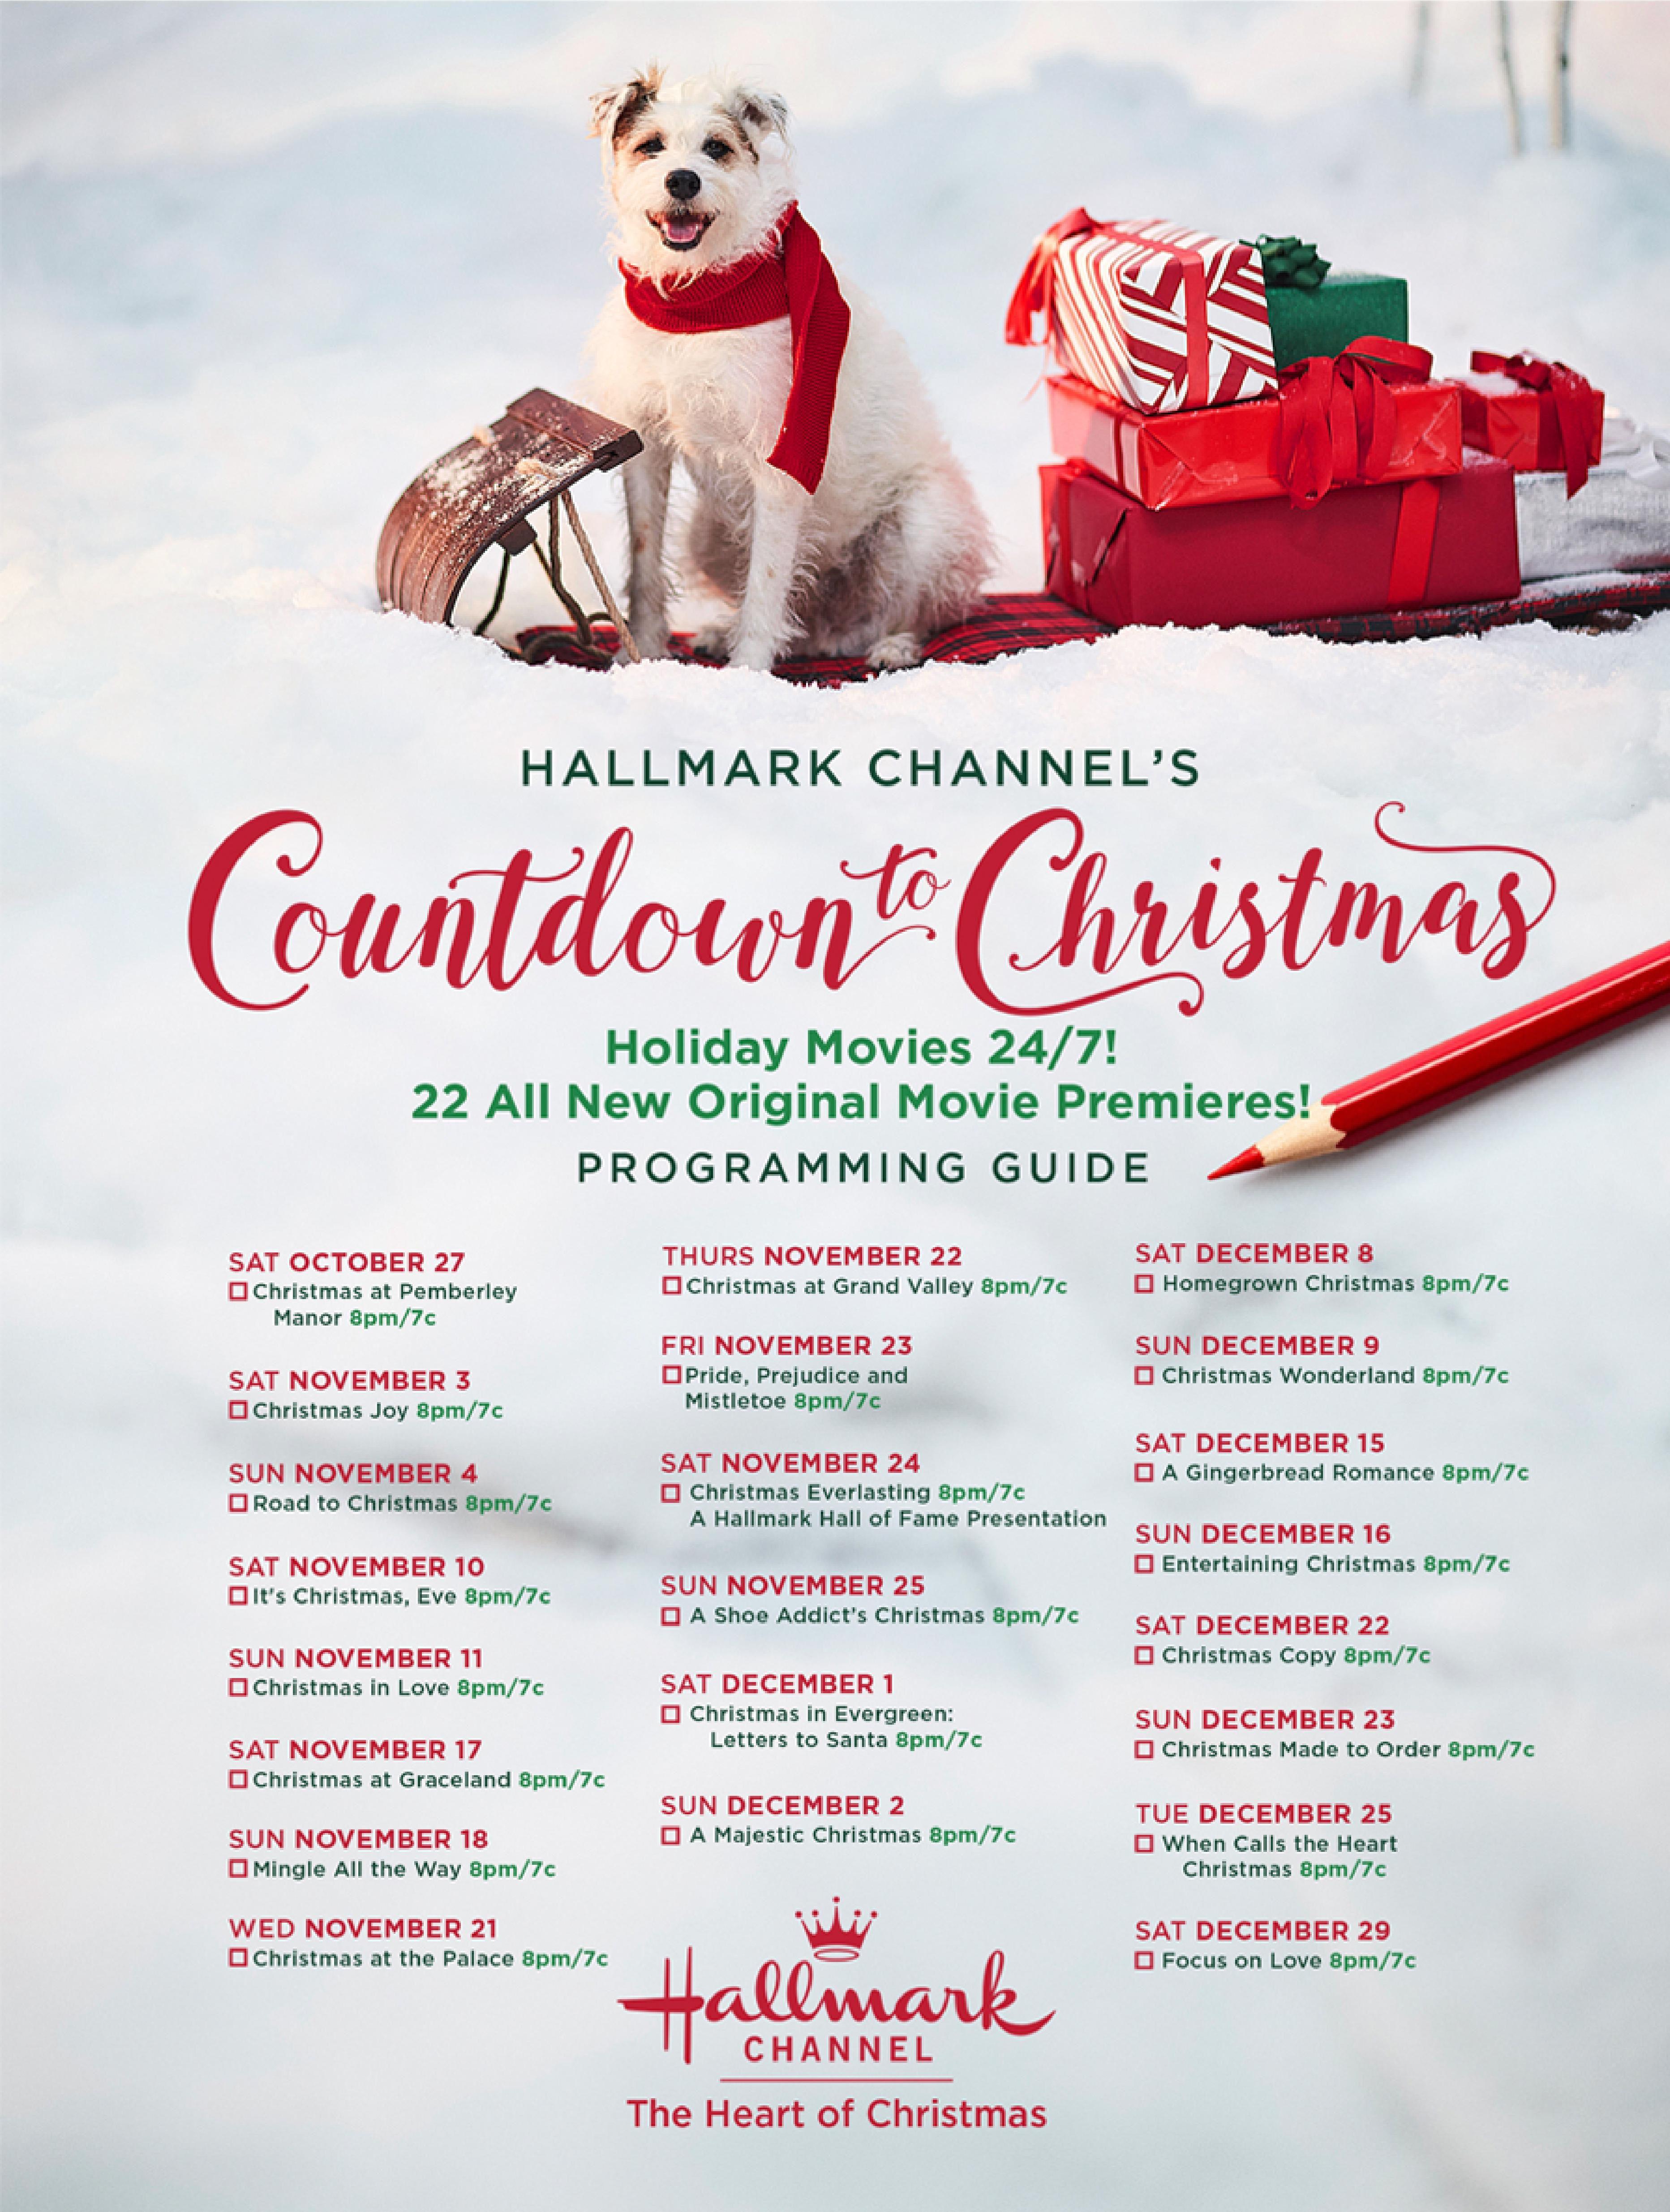 hallmark channel releases 2018 christmas movie schedule - set your